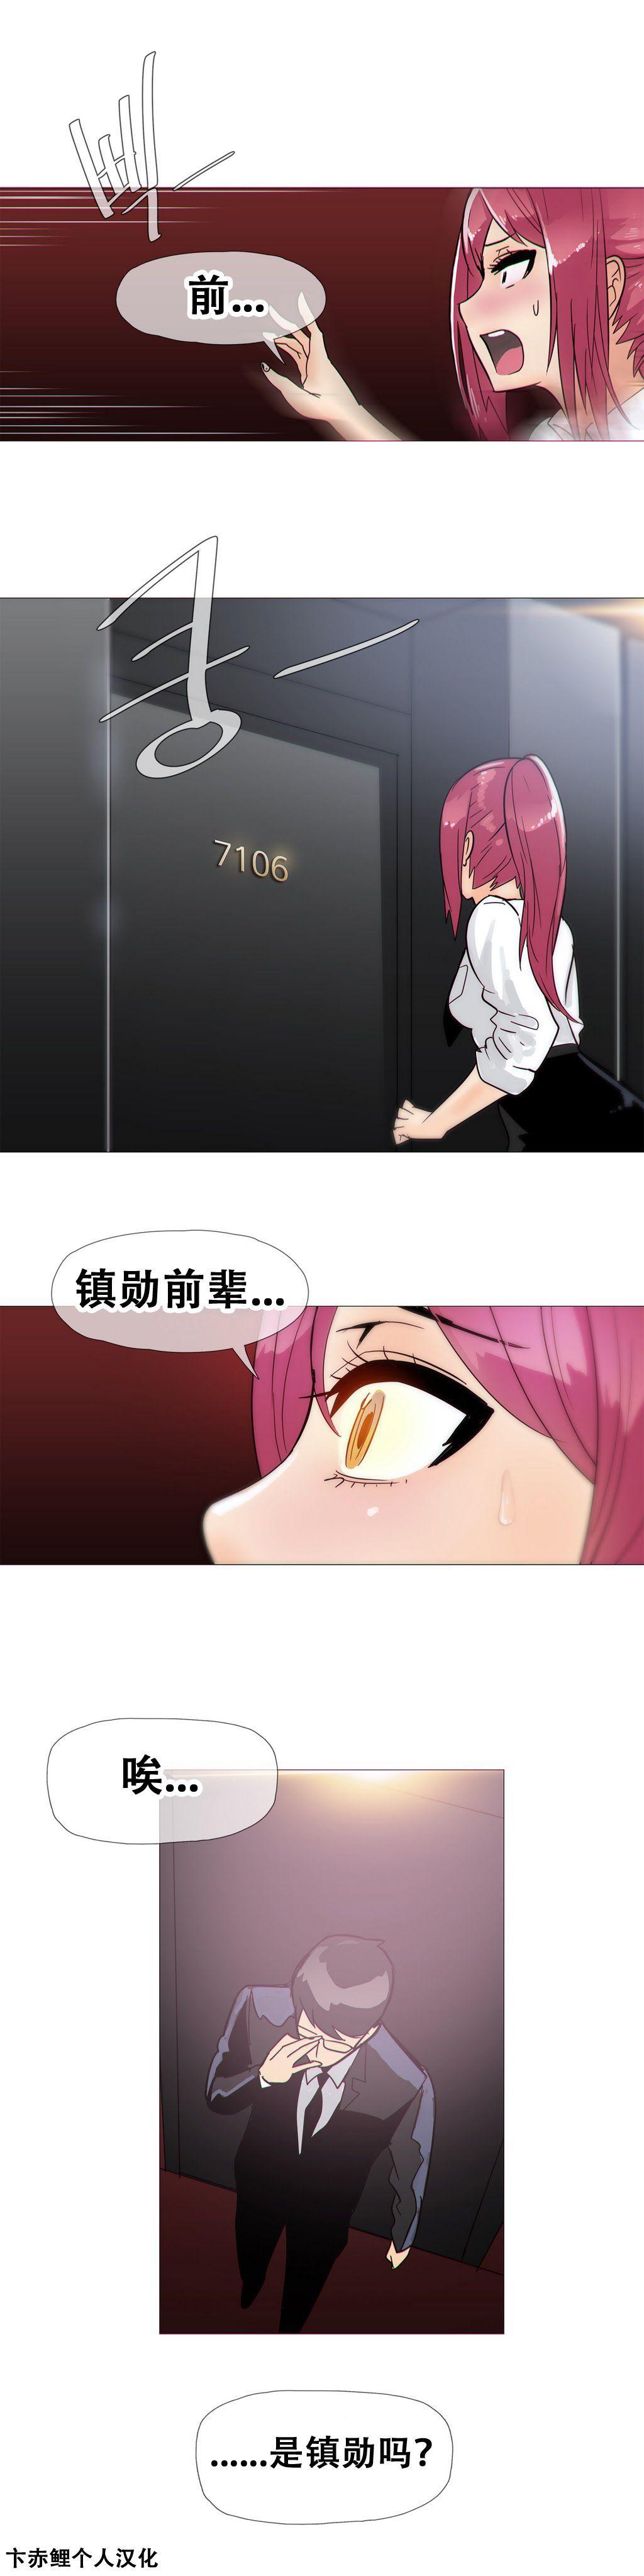 HouseHold Affairs 【卞赤鲤个人汉化】1~33话(持续更新中) 324